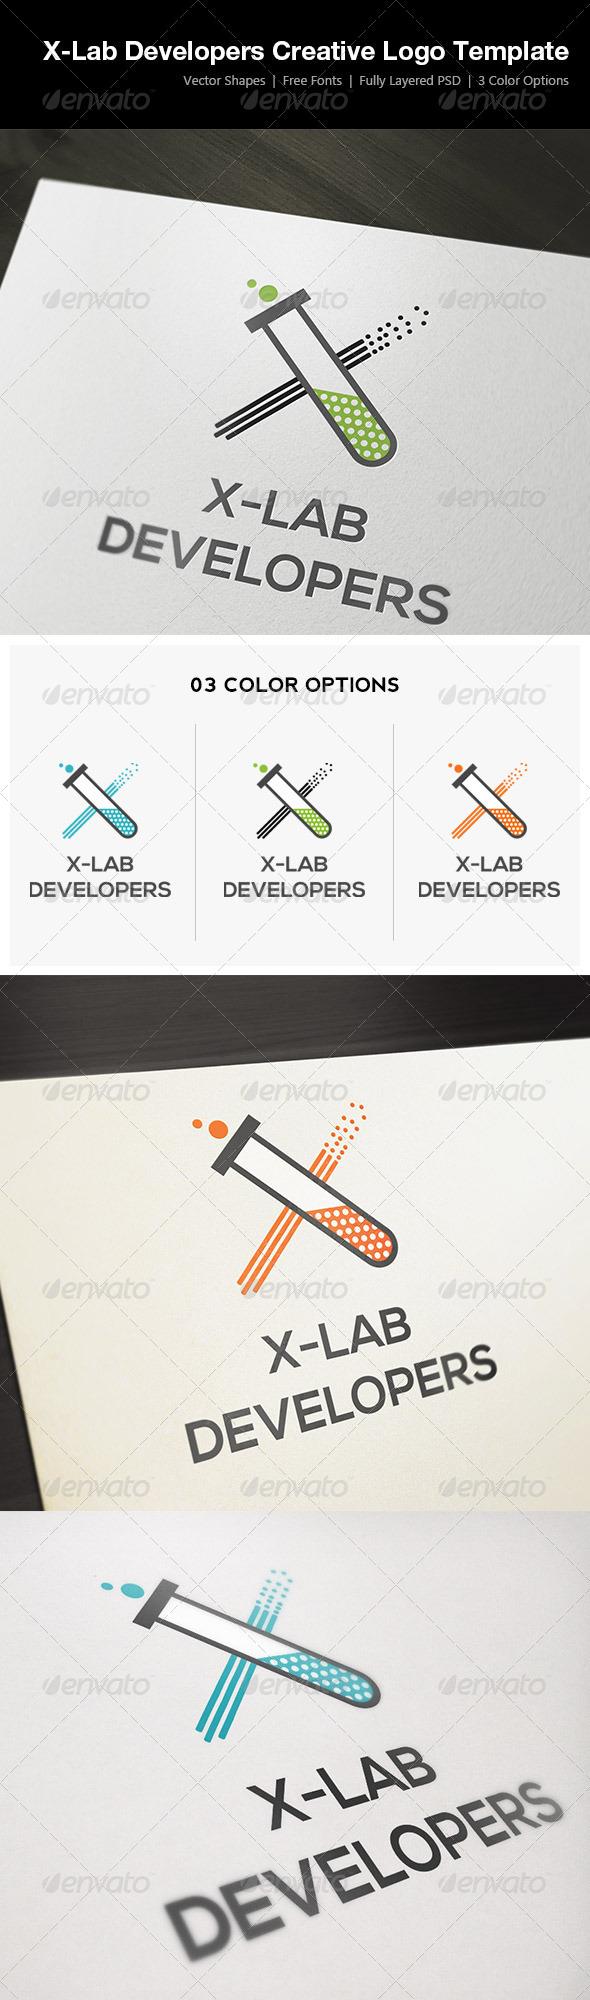 X-Lab Developers Creative Logo Template